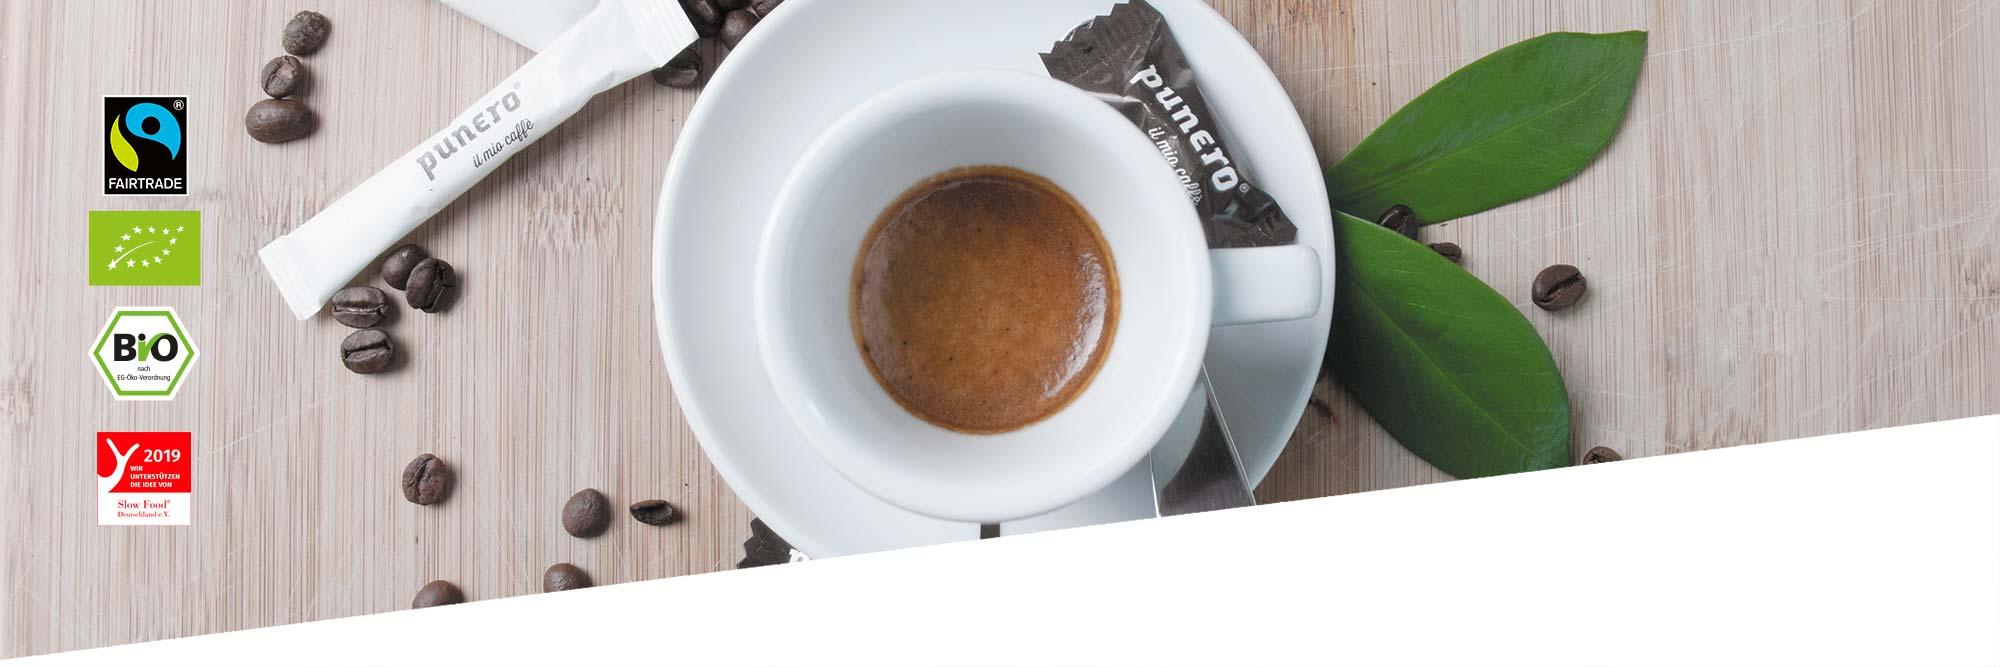 Espresso in Tasse